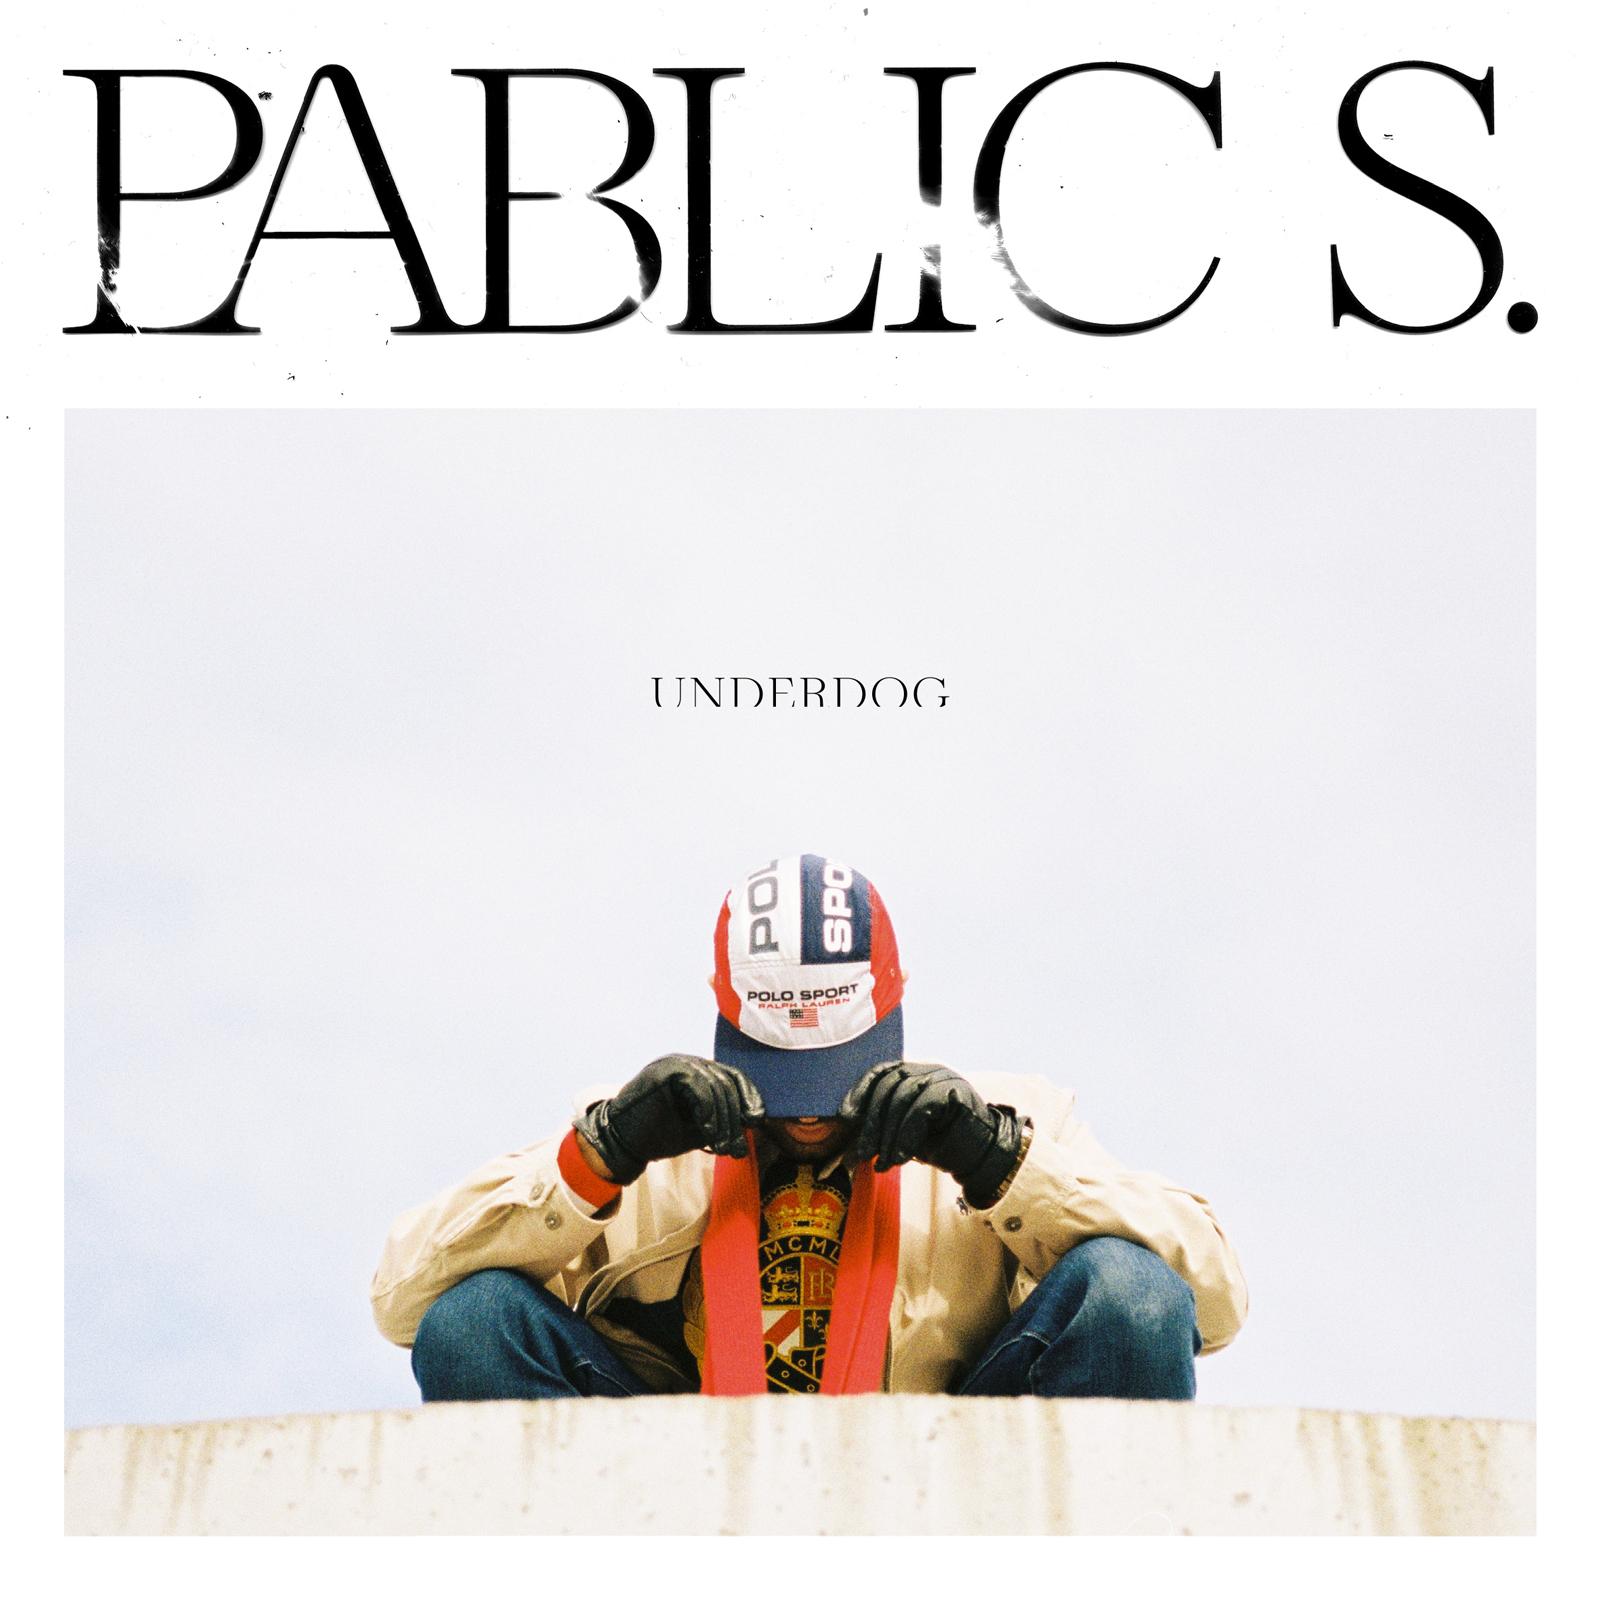 Pablic_s_underdog